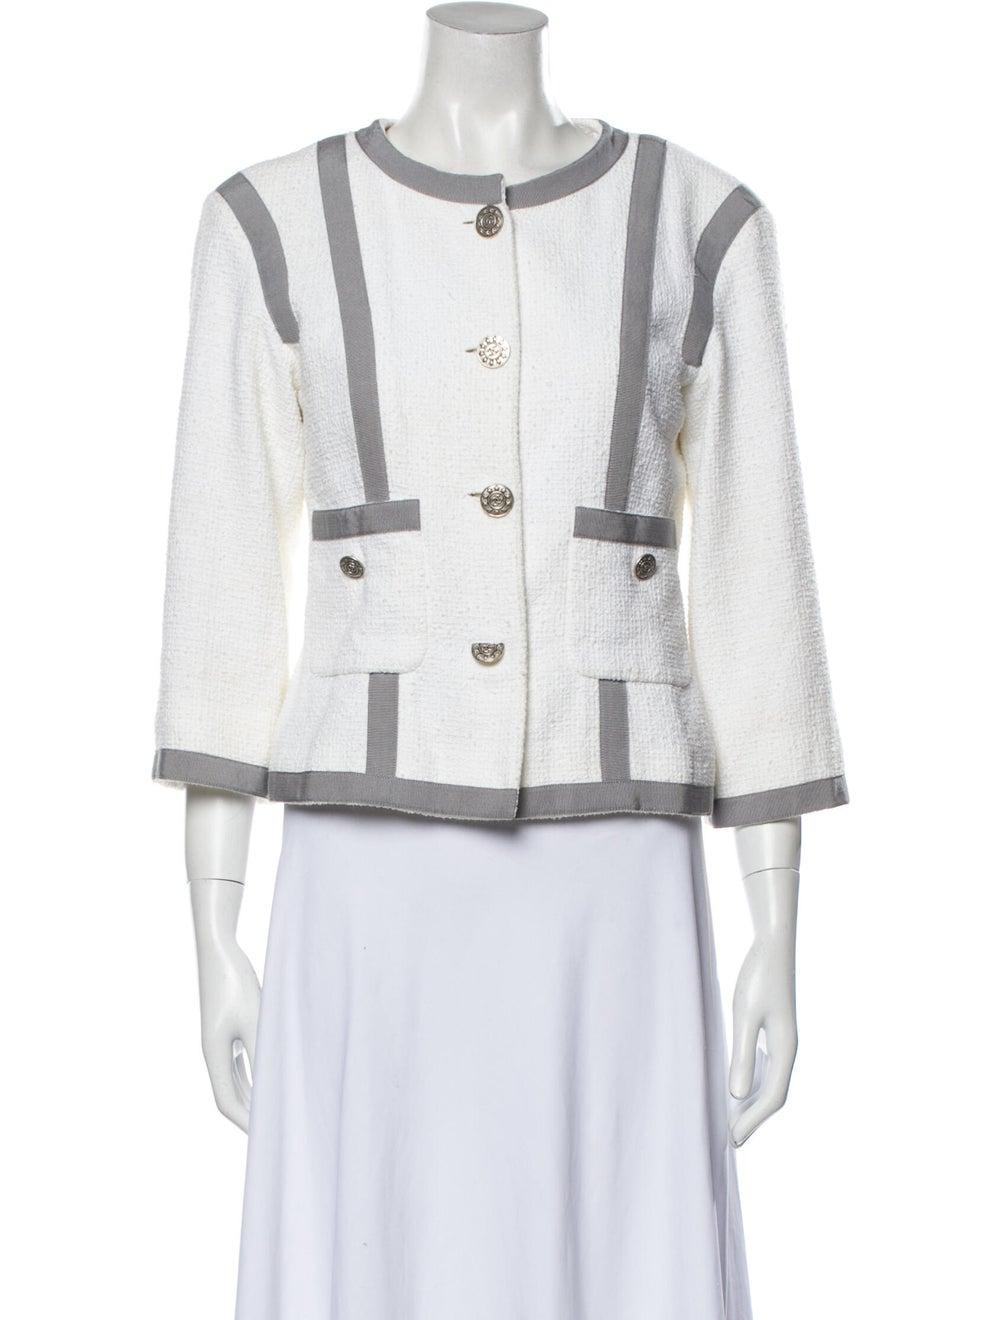 Chanel 2013 Striped Jacket - image 1